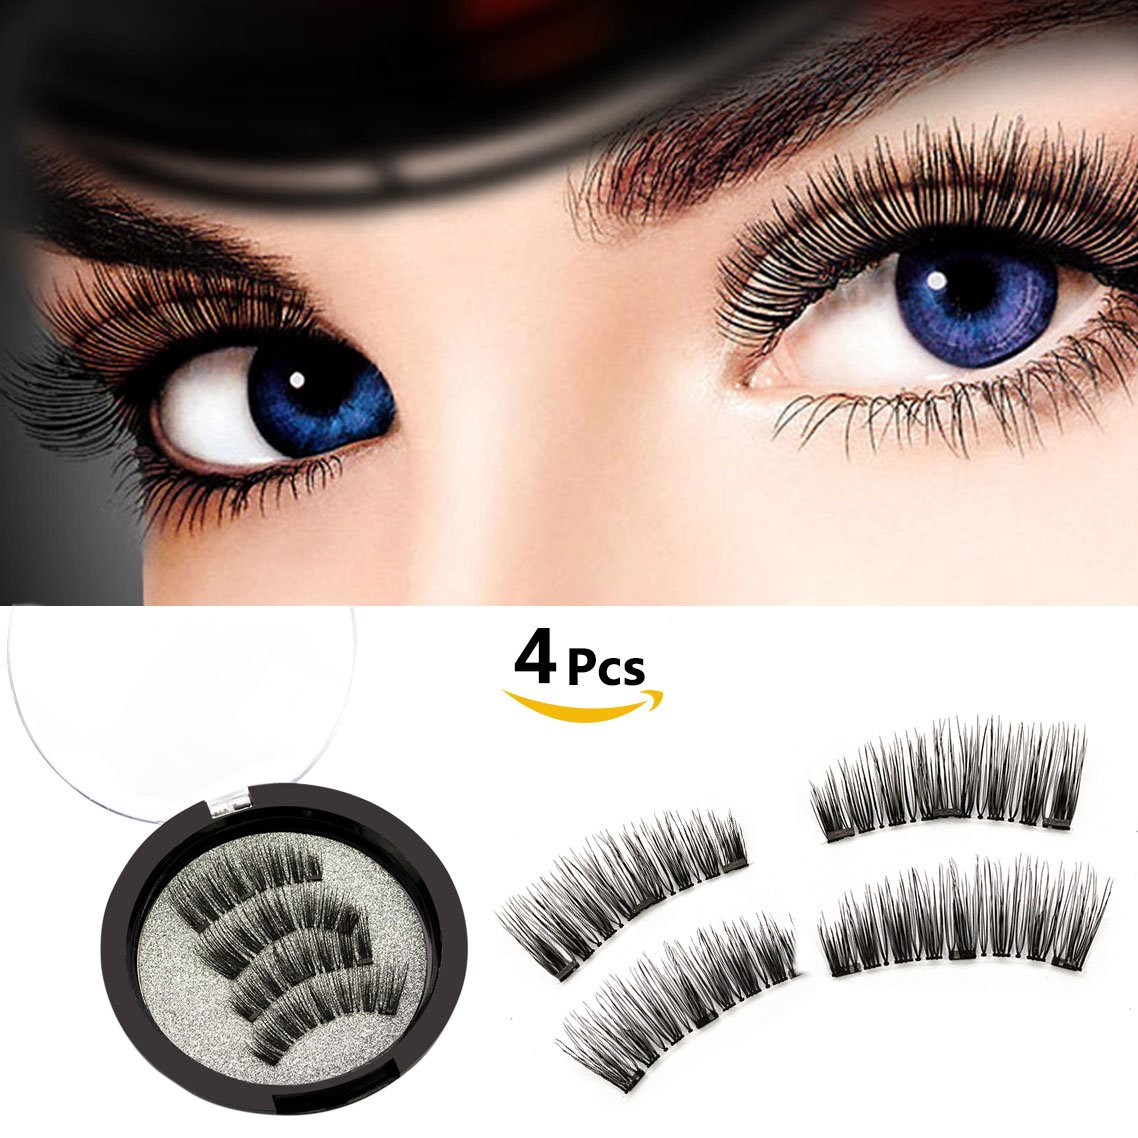 c5488733b6c Amazon.com : Reusable Magnetic False Eyelashes Ultra Comfortable Fake  Lashes Natural Look Long Fake Eyelashes Set No Glue Mess Triple Magnets False  Lashes ...